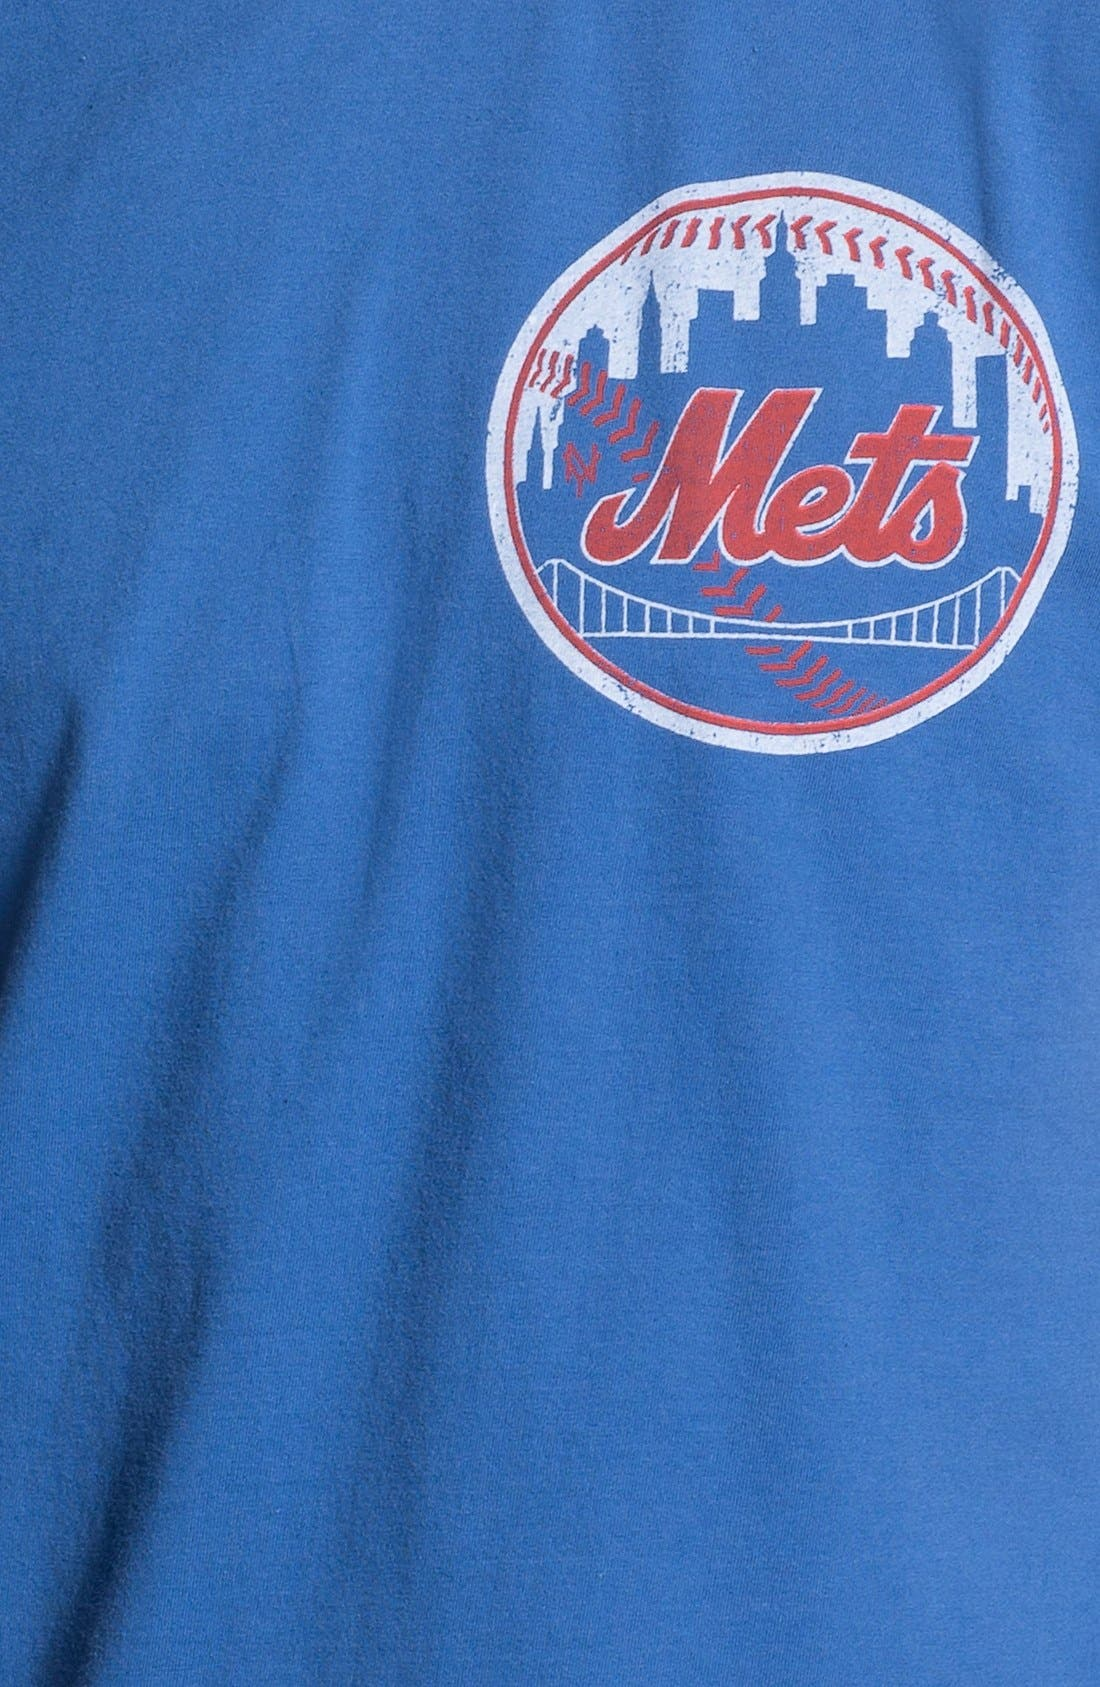 Alternate Image 3  - Red Jacket 'New York Mets' Trim Fit Ringer T-Shirt (Men)